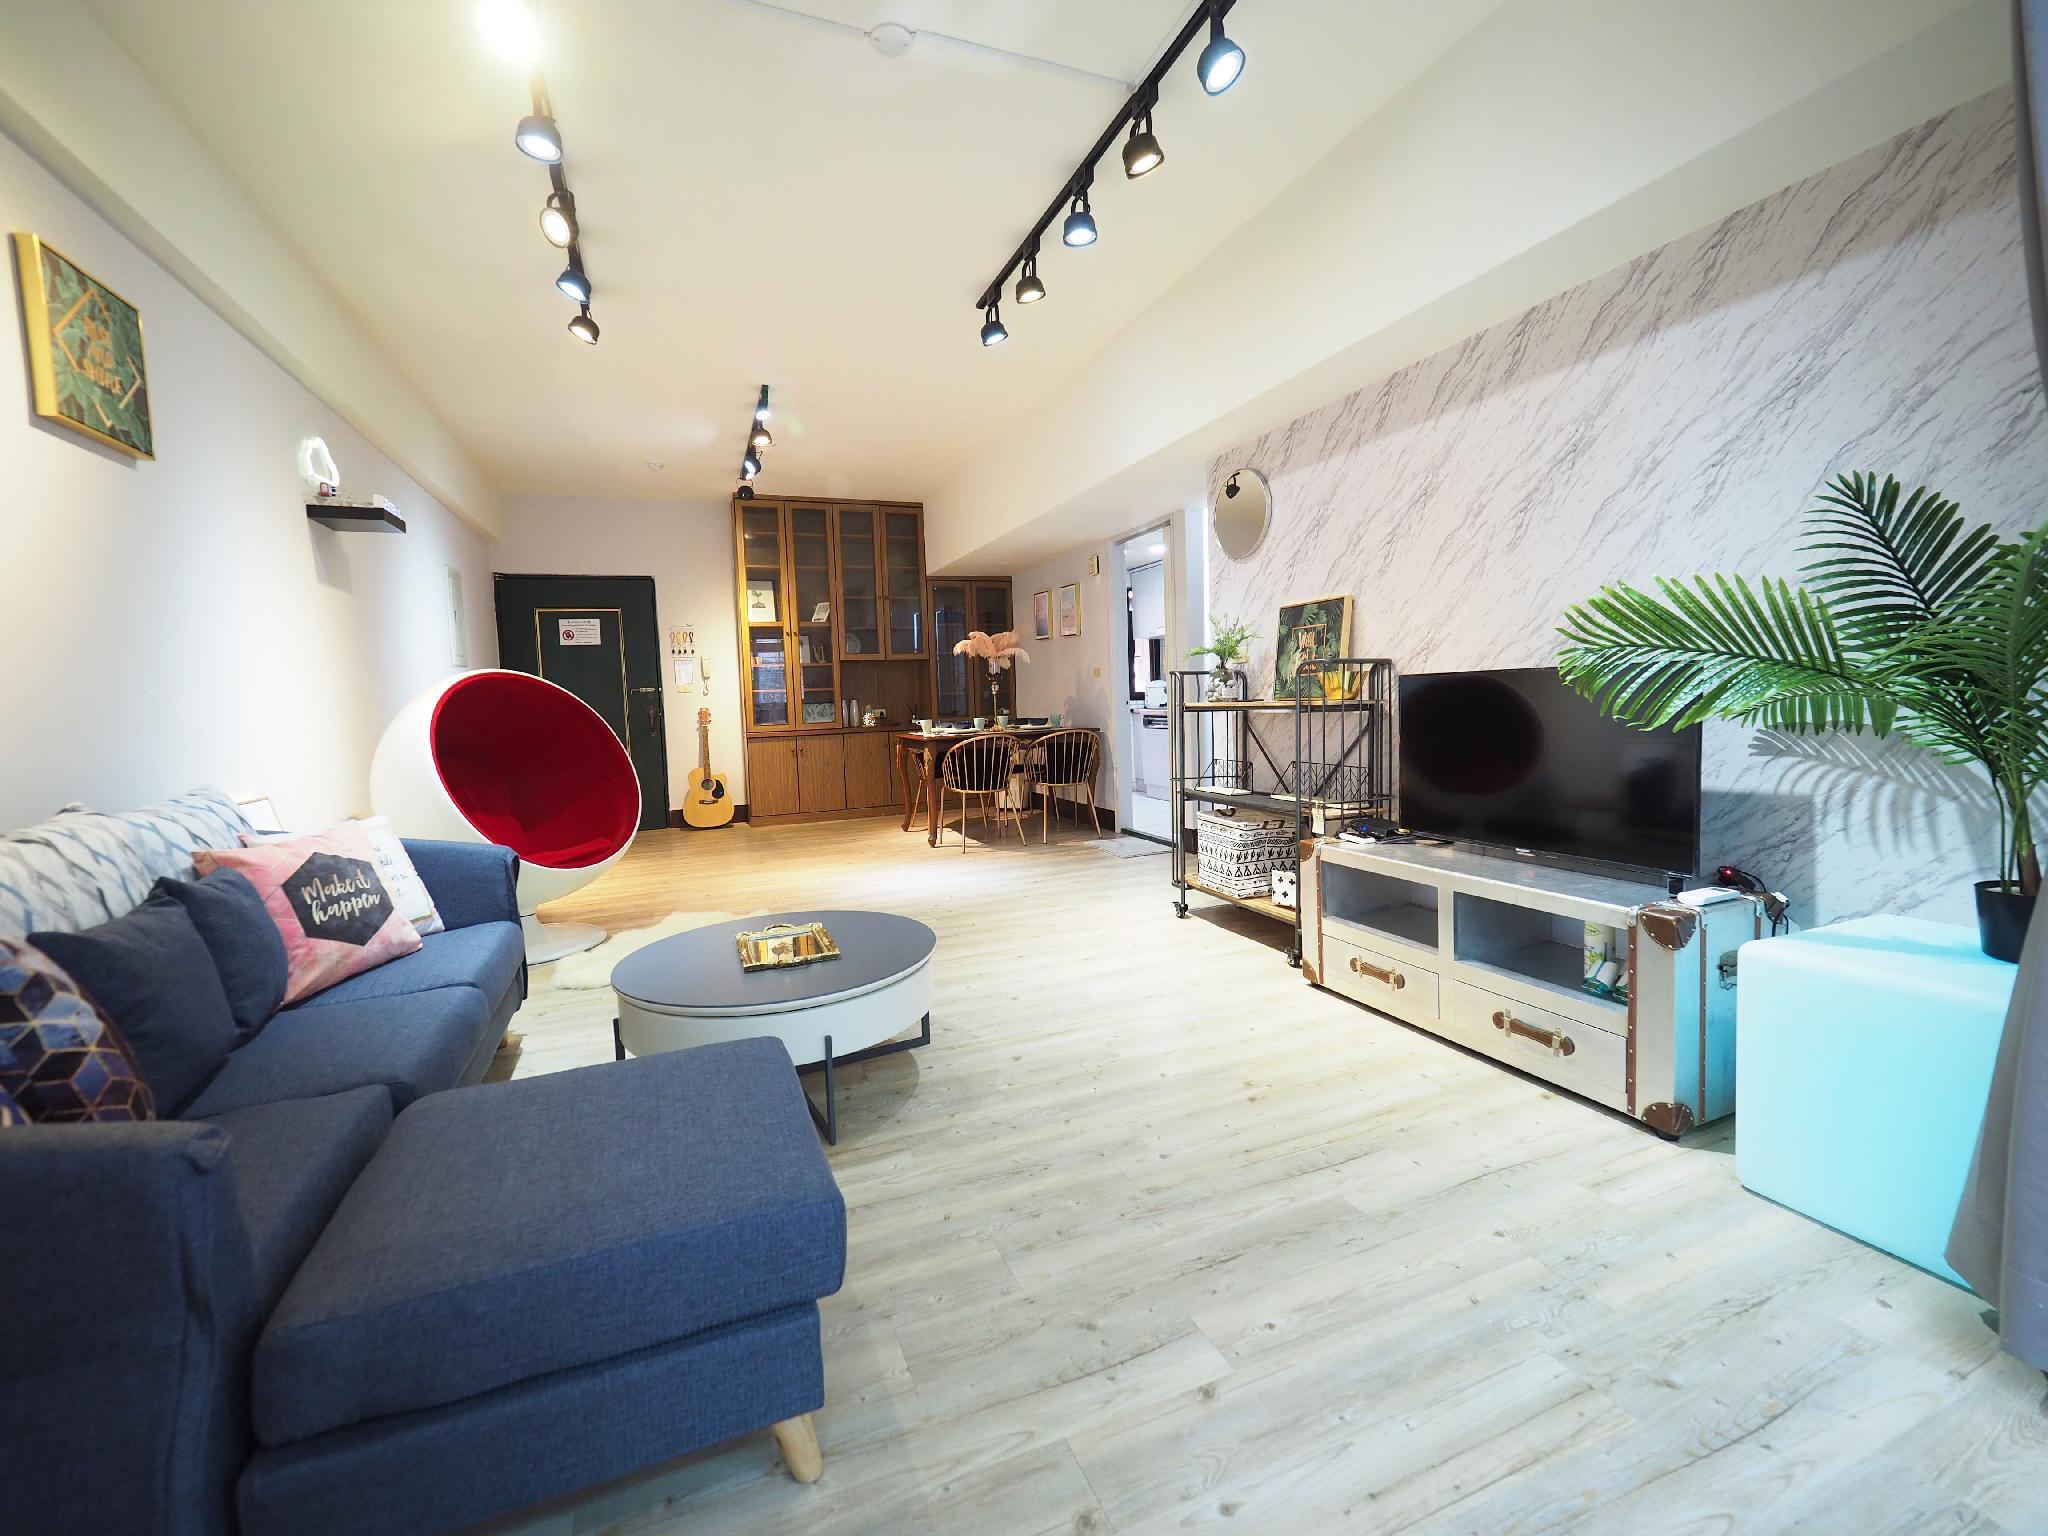 N.T.U Great Value designer house 3BD Best Location